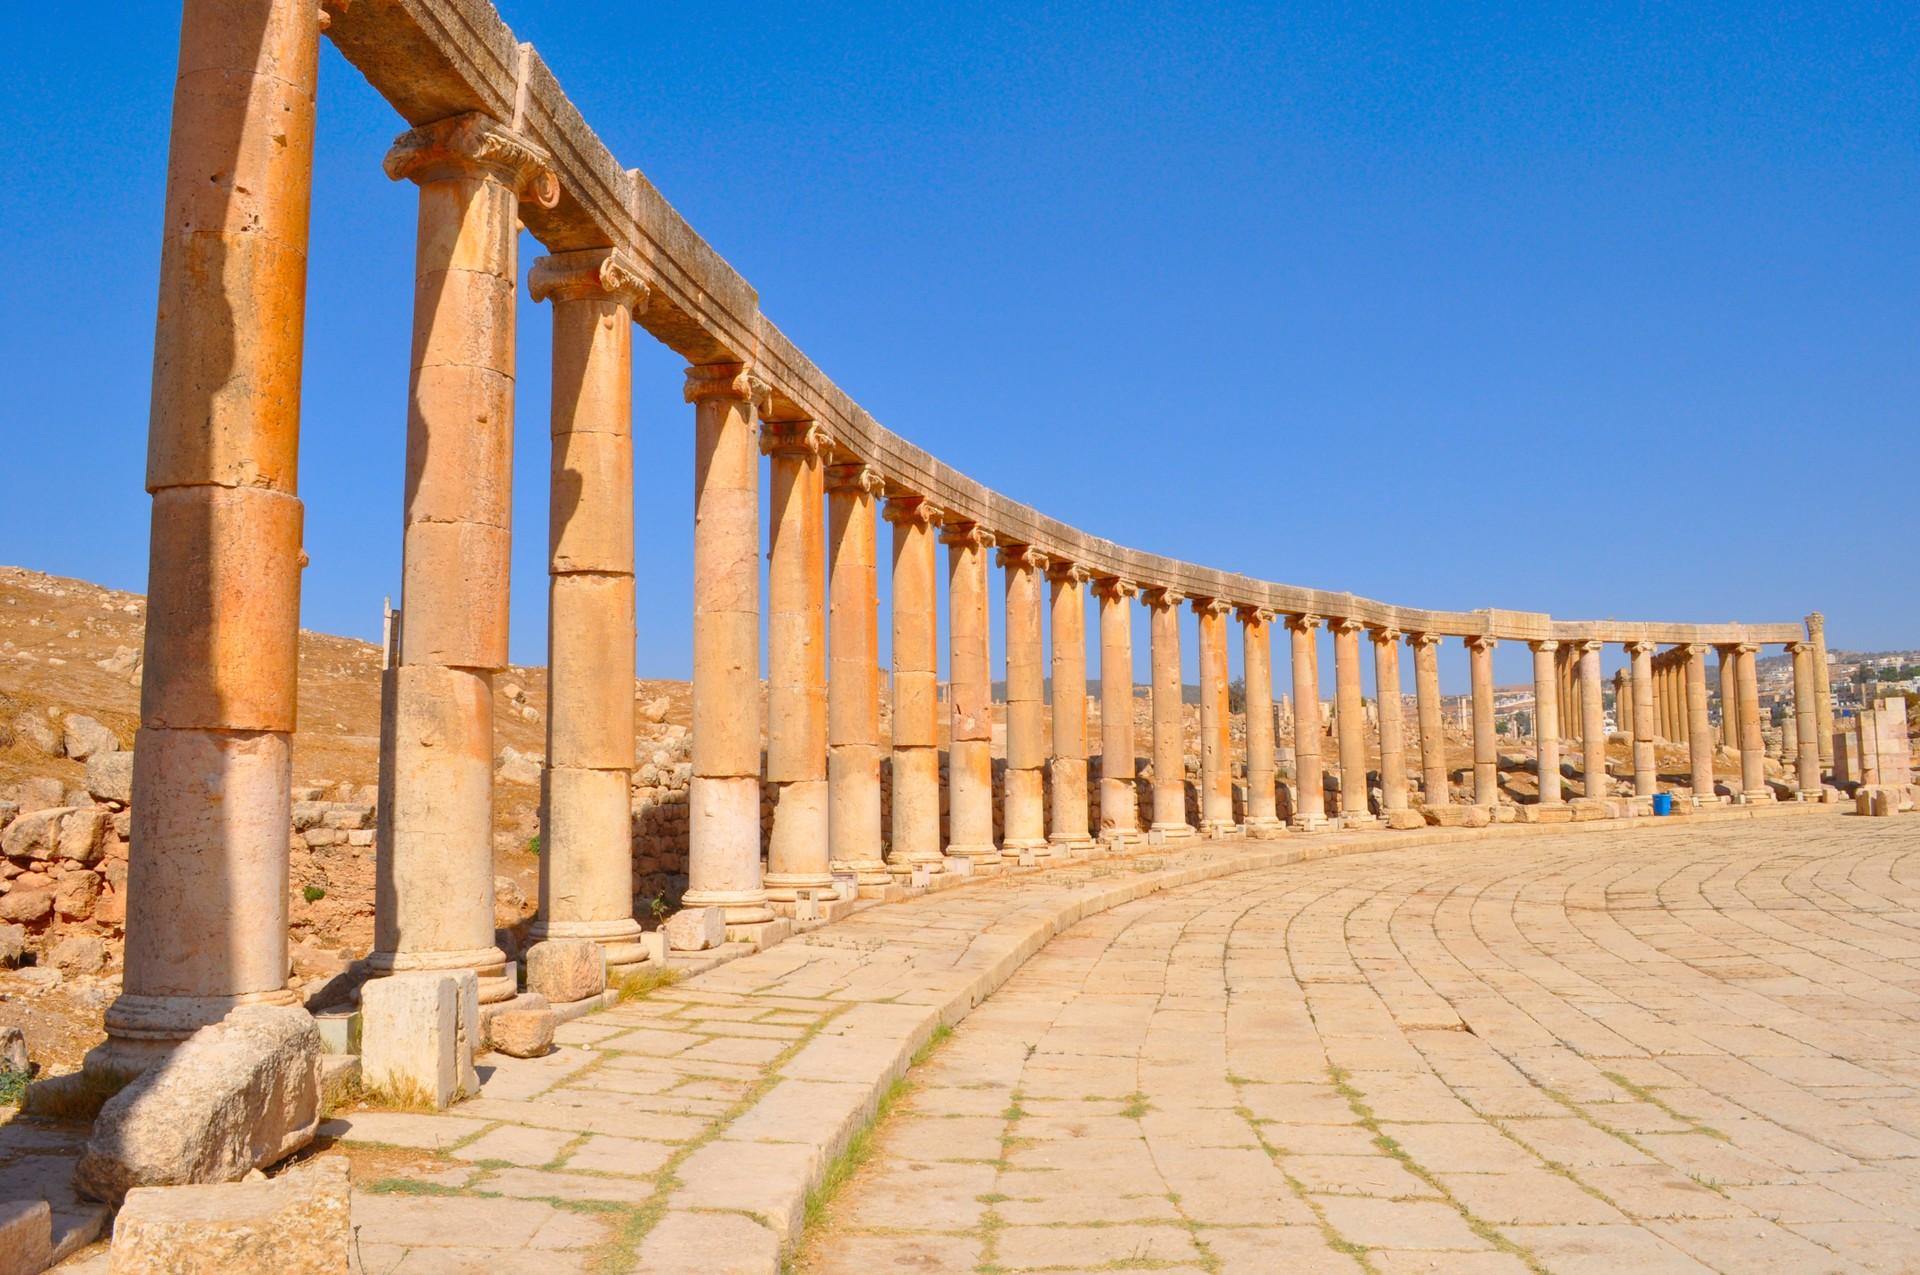 Colonnade in Jerash, Jordan